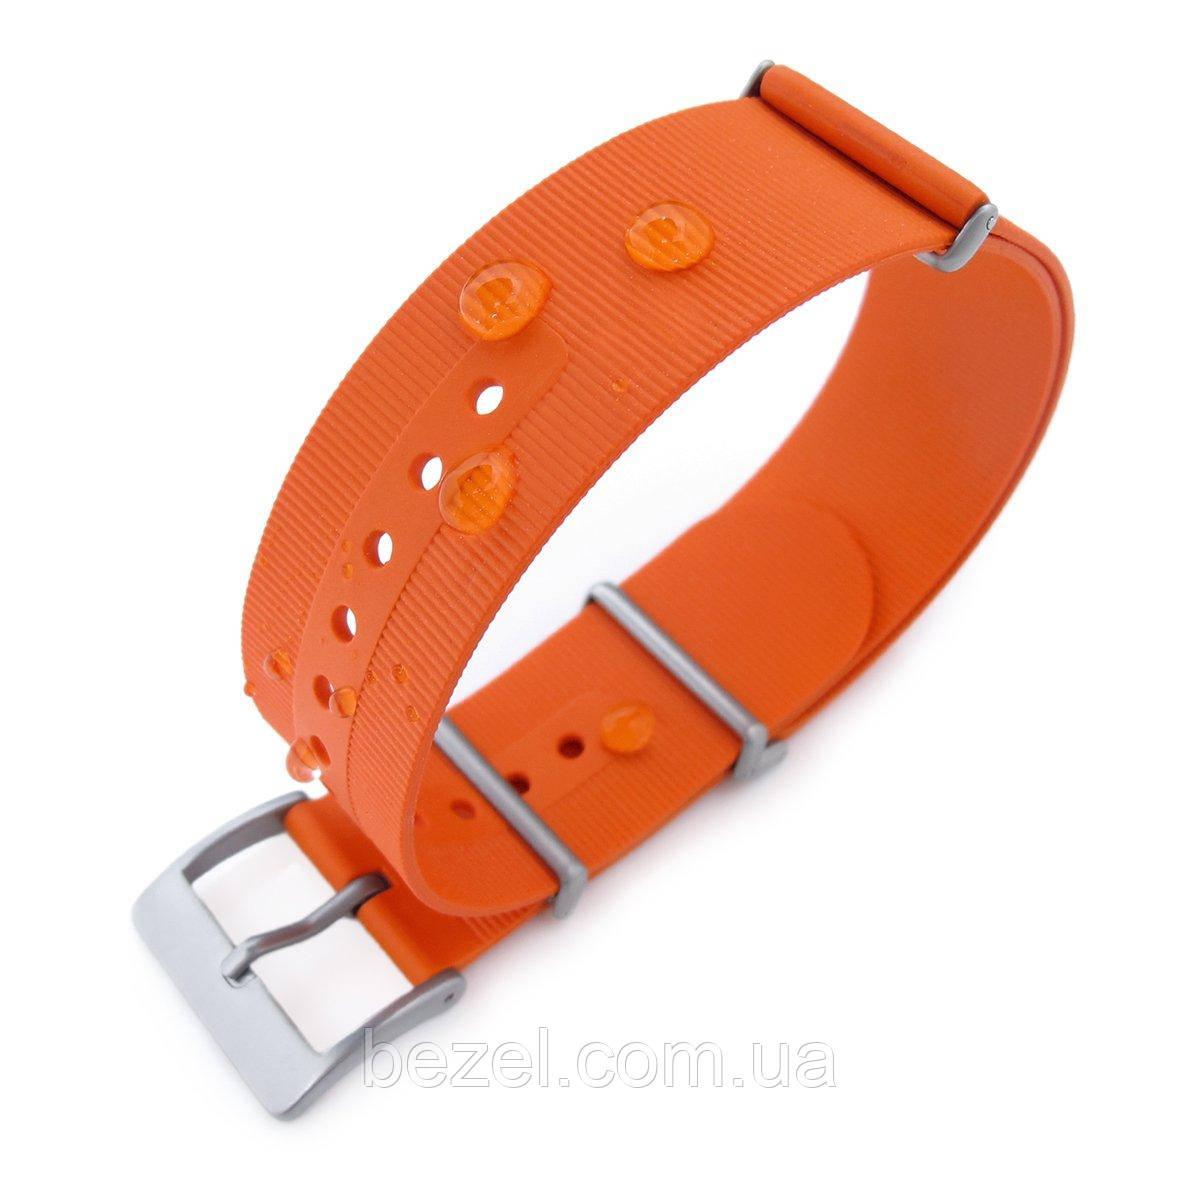 Rubber NATO 22mm G10 Waterproof Watch Band, Orange, Sandblasted Buckle